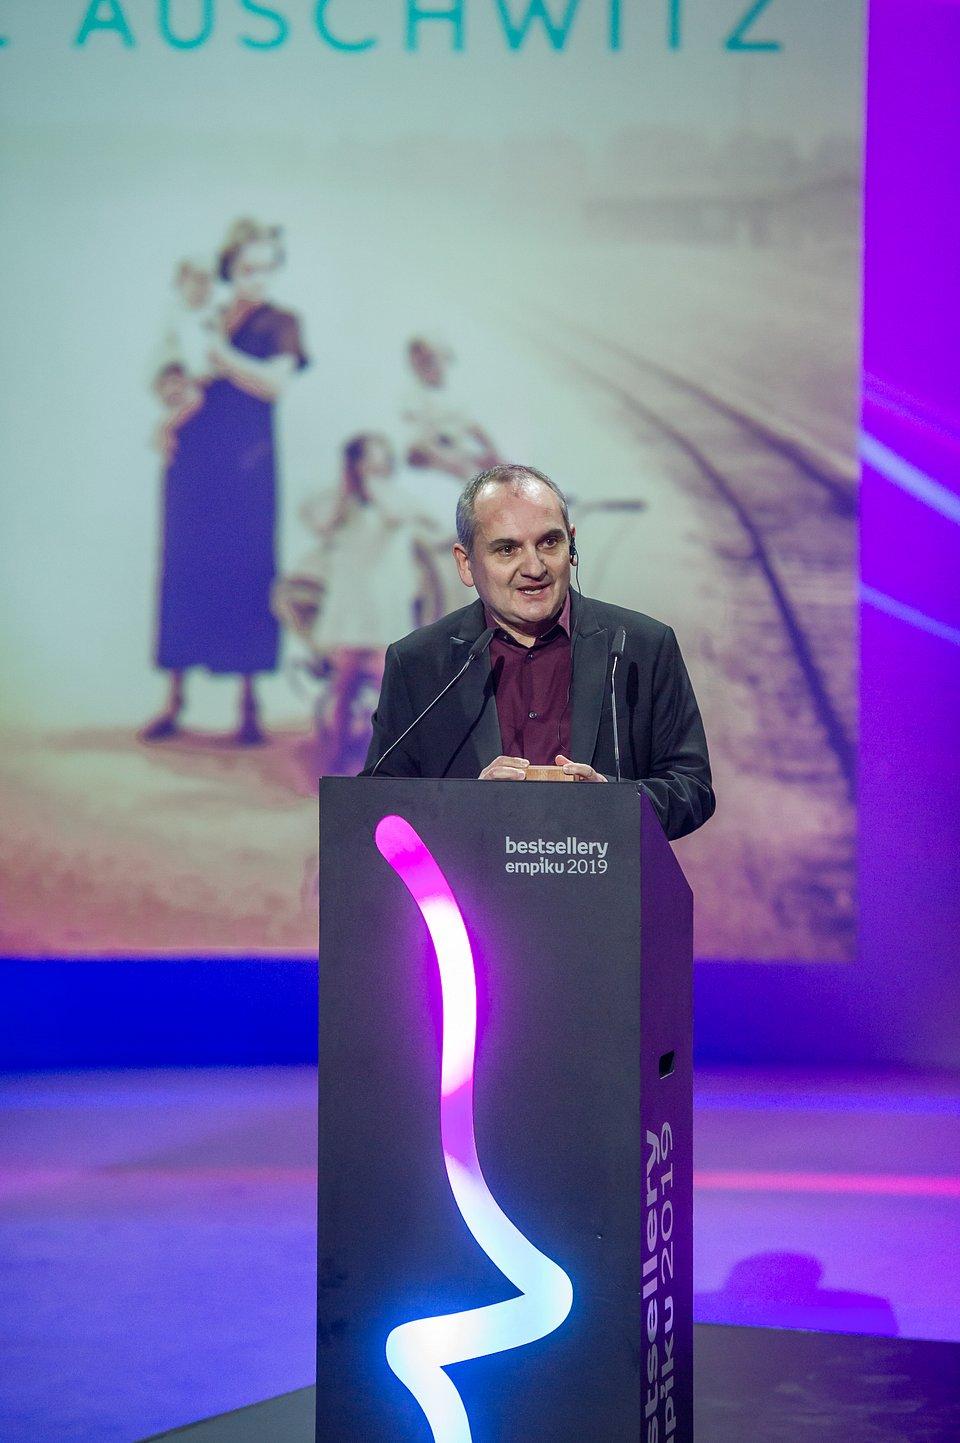 Mario Escobar z Bestsellerem Empiku 2019 w kategorii literatura piękna